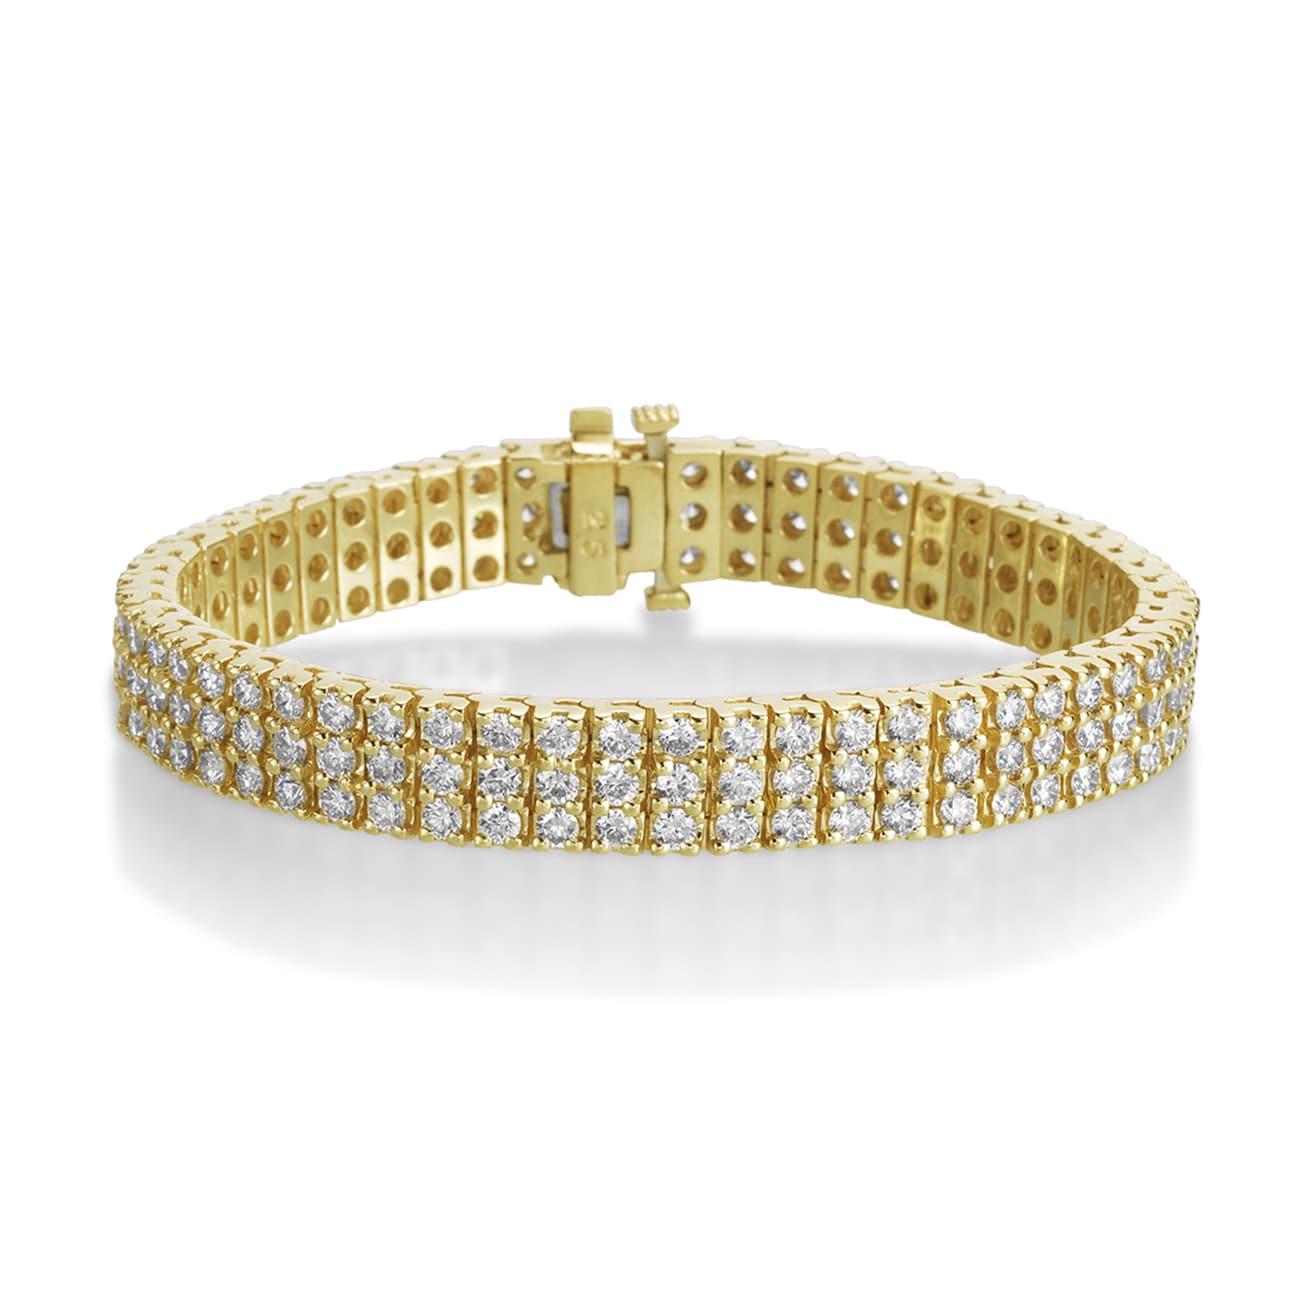 198b90f1118fb SummerRose 14k Yellow Gold 10ct 3-row Diamond Tennis Bracelet